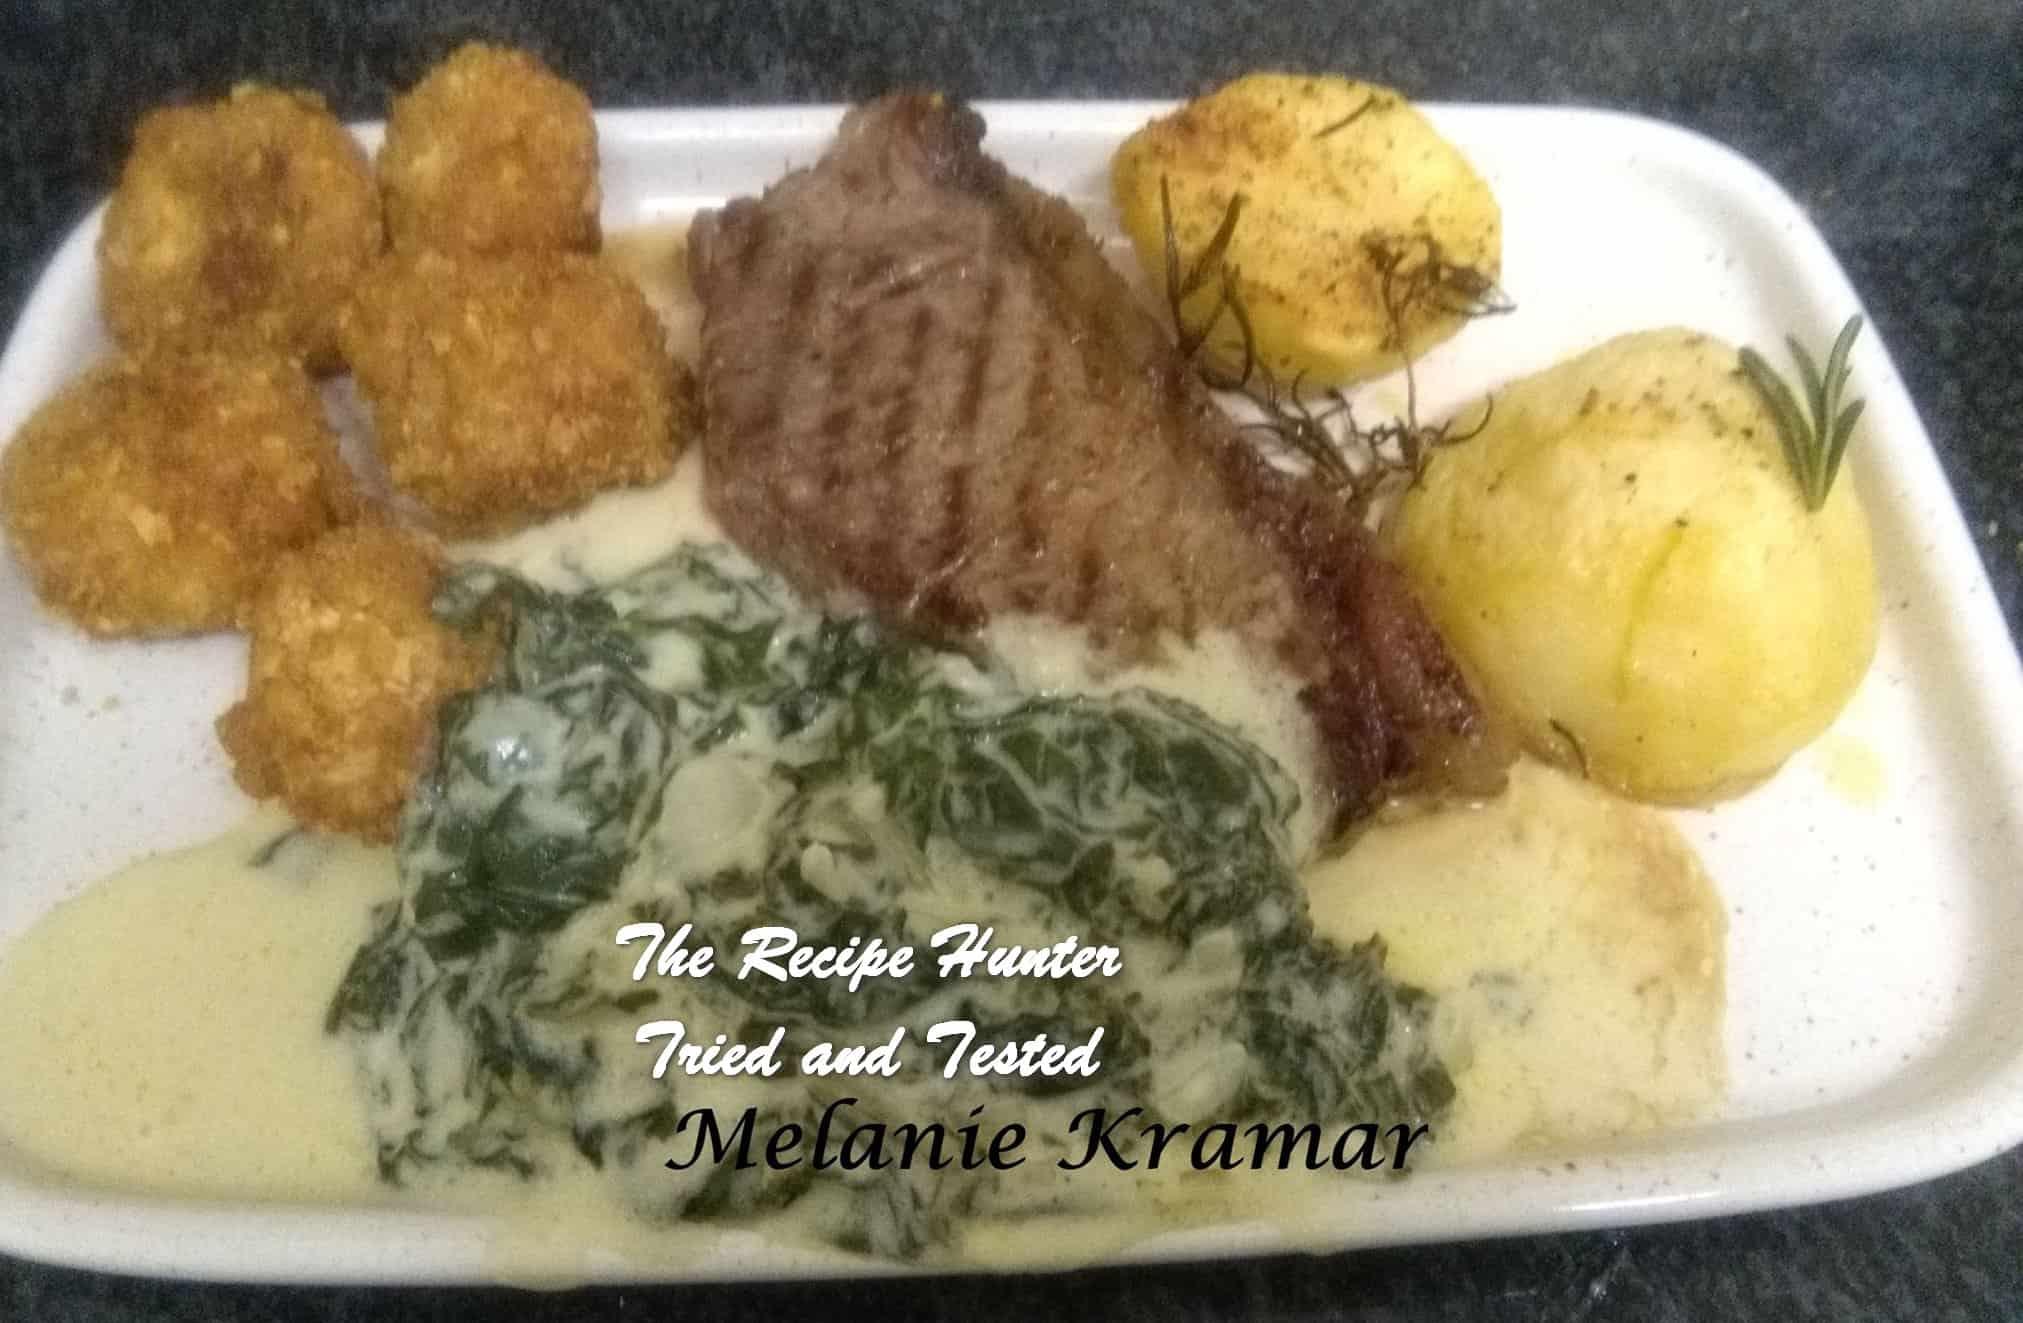 TRH Melanie's Grilled Porterhouse Steaks and Vegetables